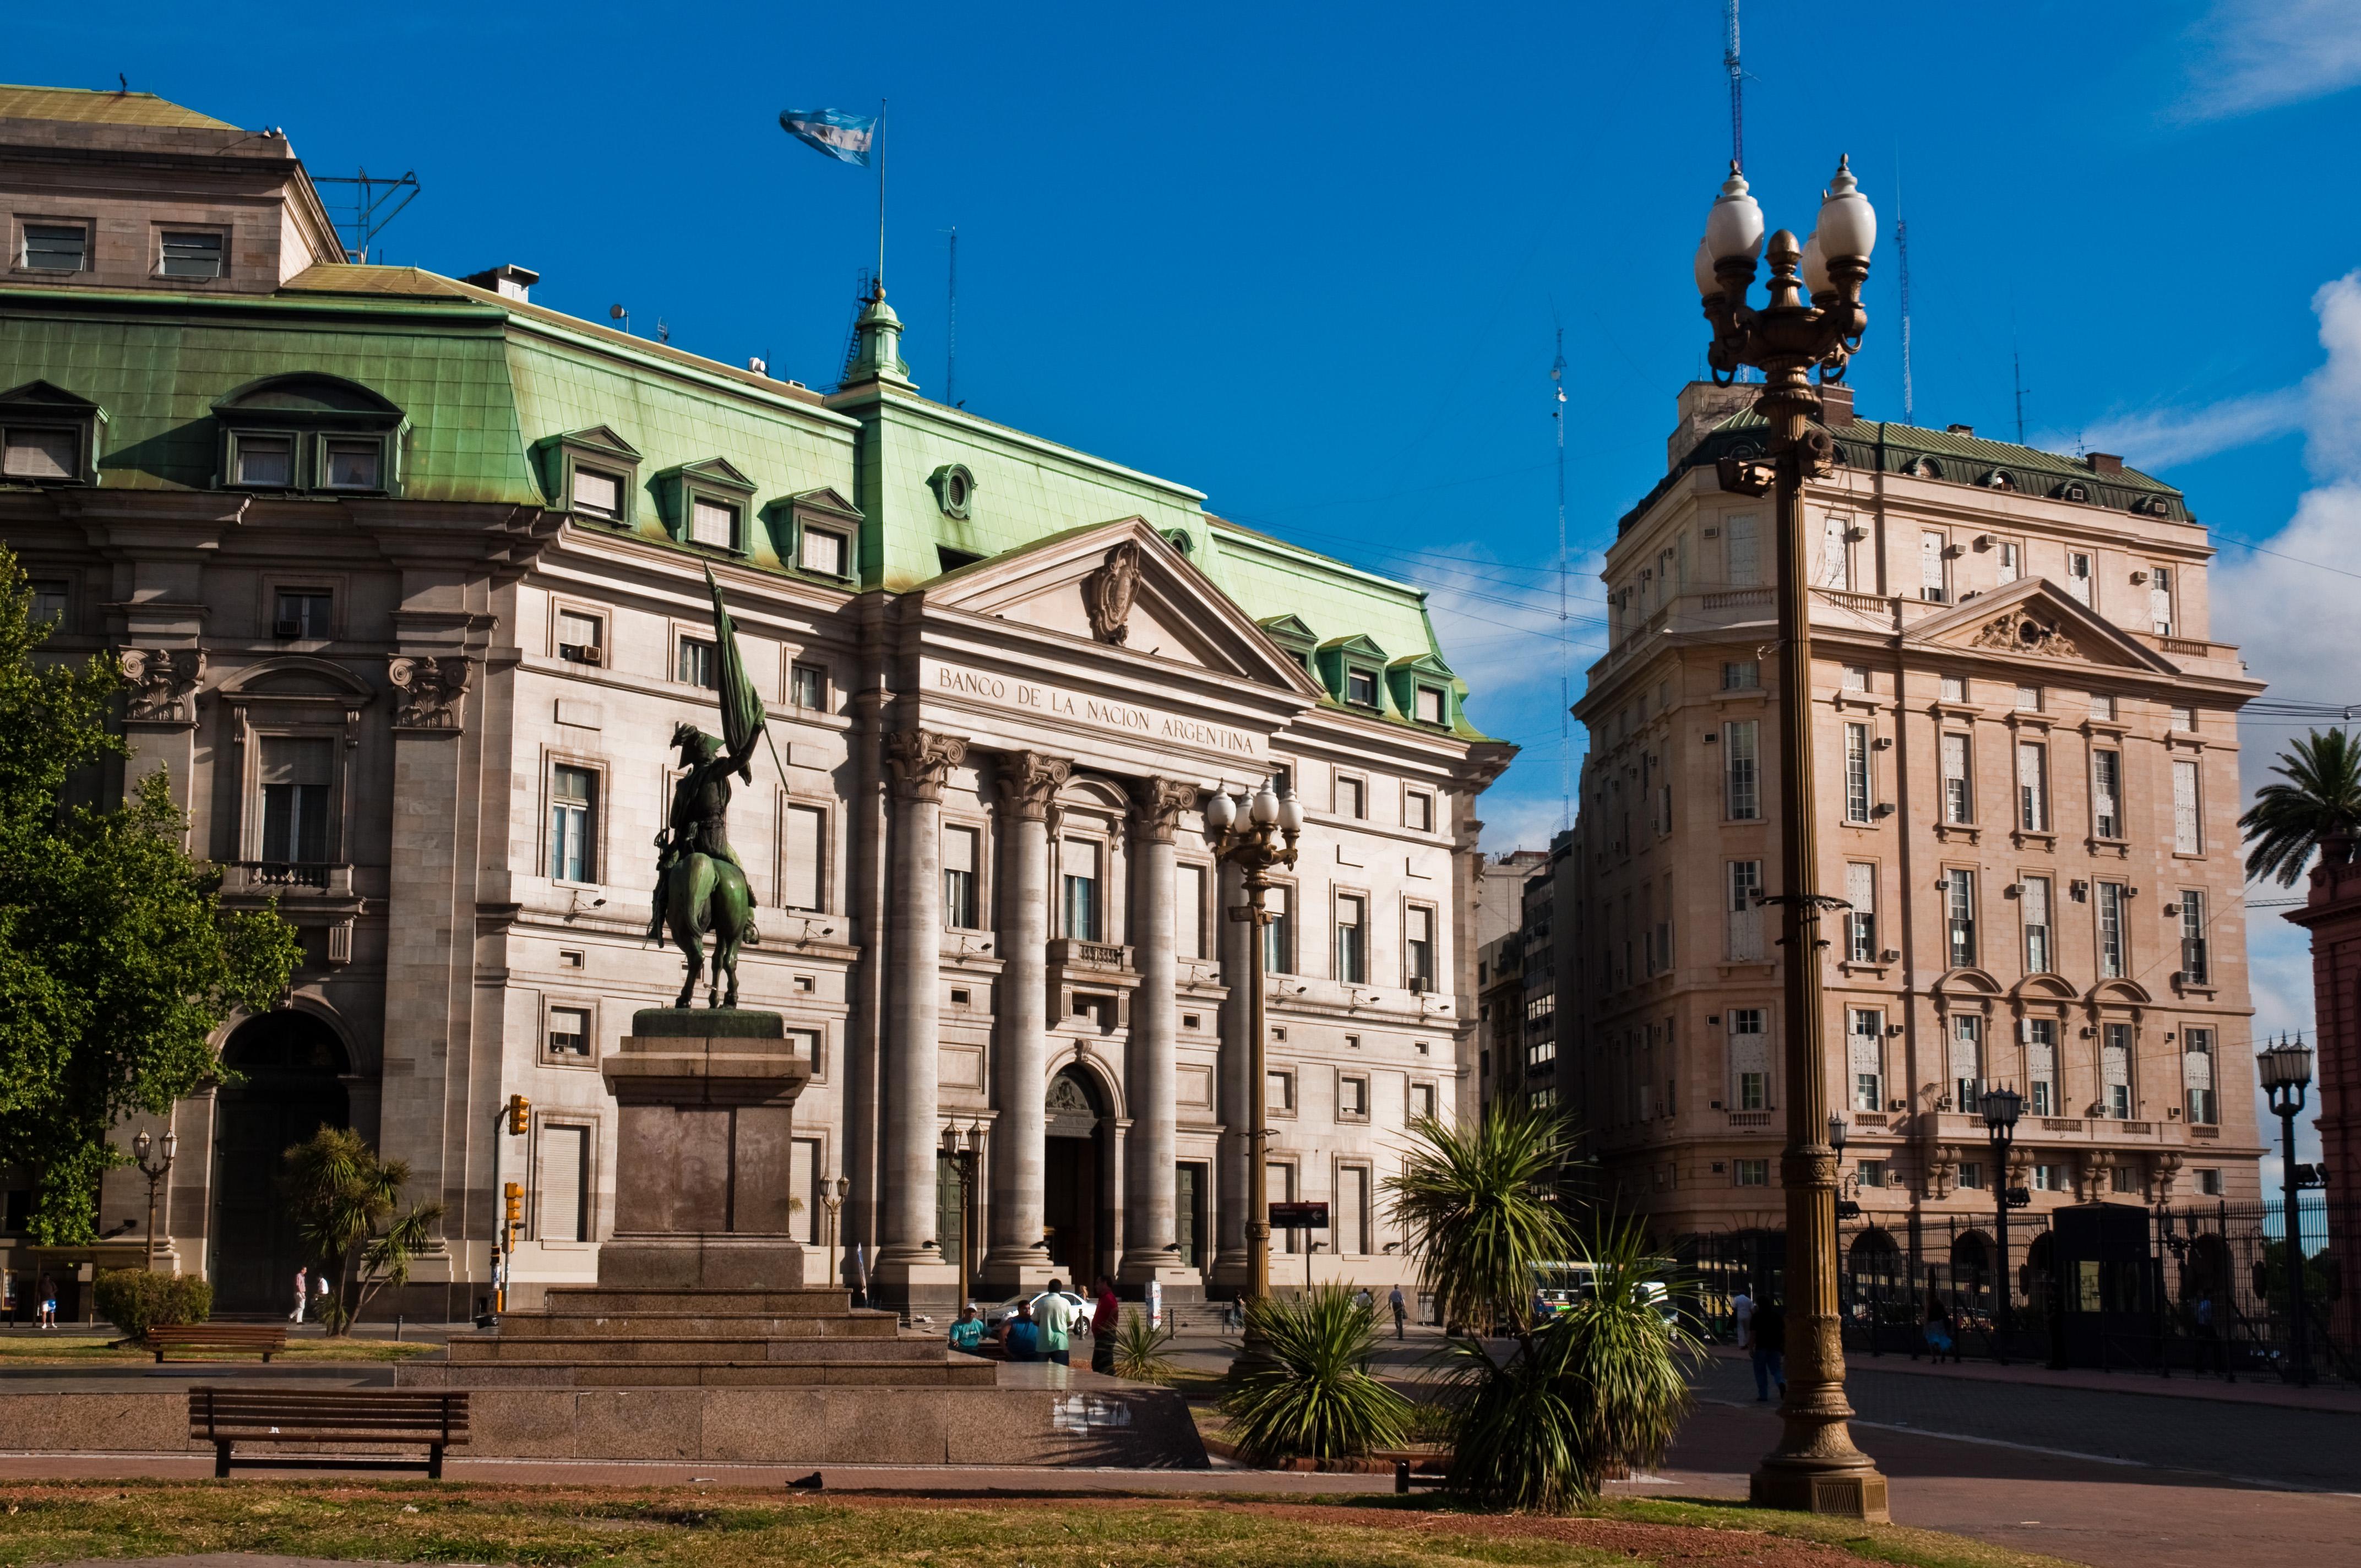 Fotografije glavnih gradova sveta - Page 3 Banco_de_la_Naci%C3%B3n_Argentina,_Buenos_Aires,_29th._Dec._2010_-_Flickr_-_PhillipC